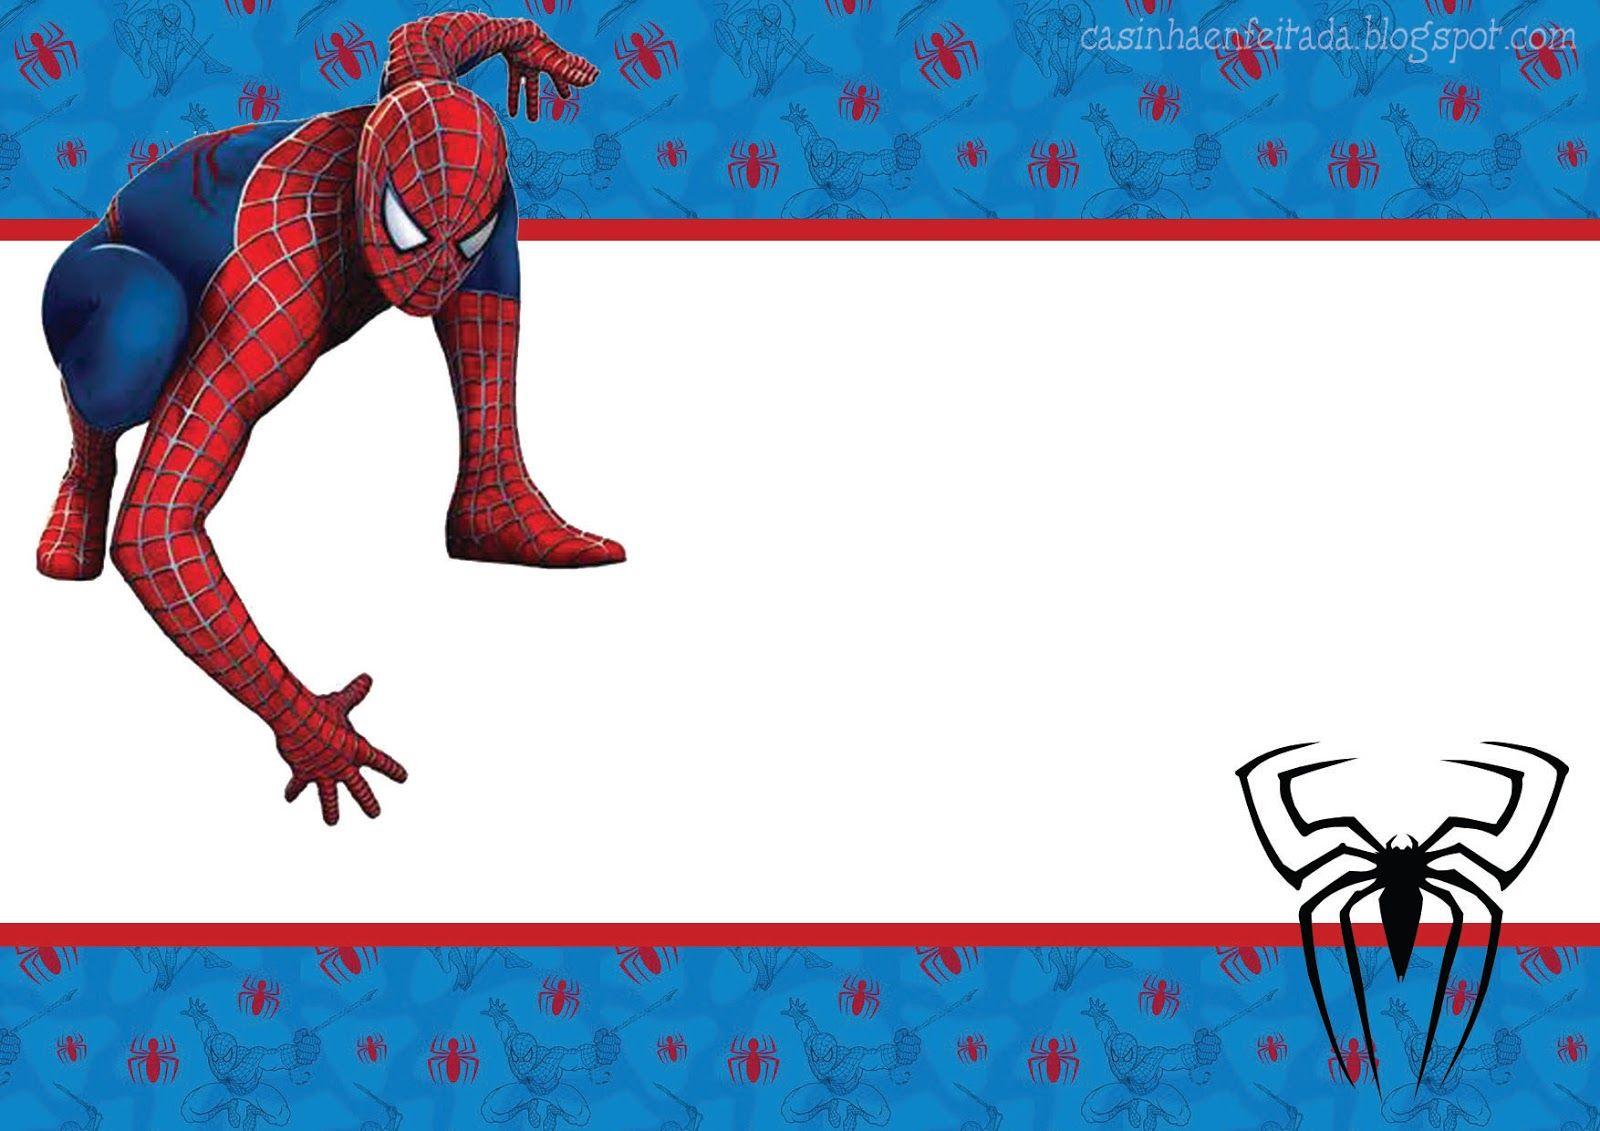 ETIQUETA PAOLO 2015 | invitacion | Pinterest | Spiderman, Birthdays ...